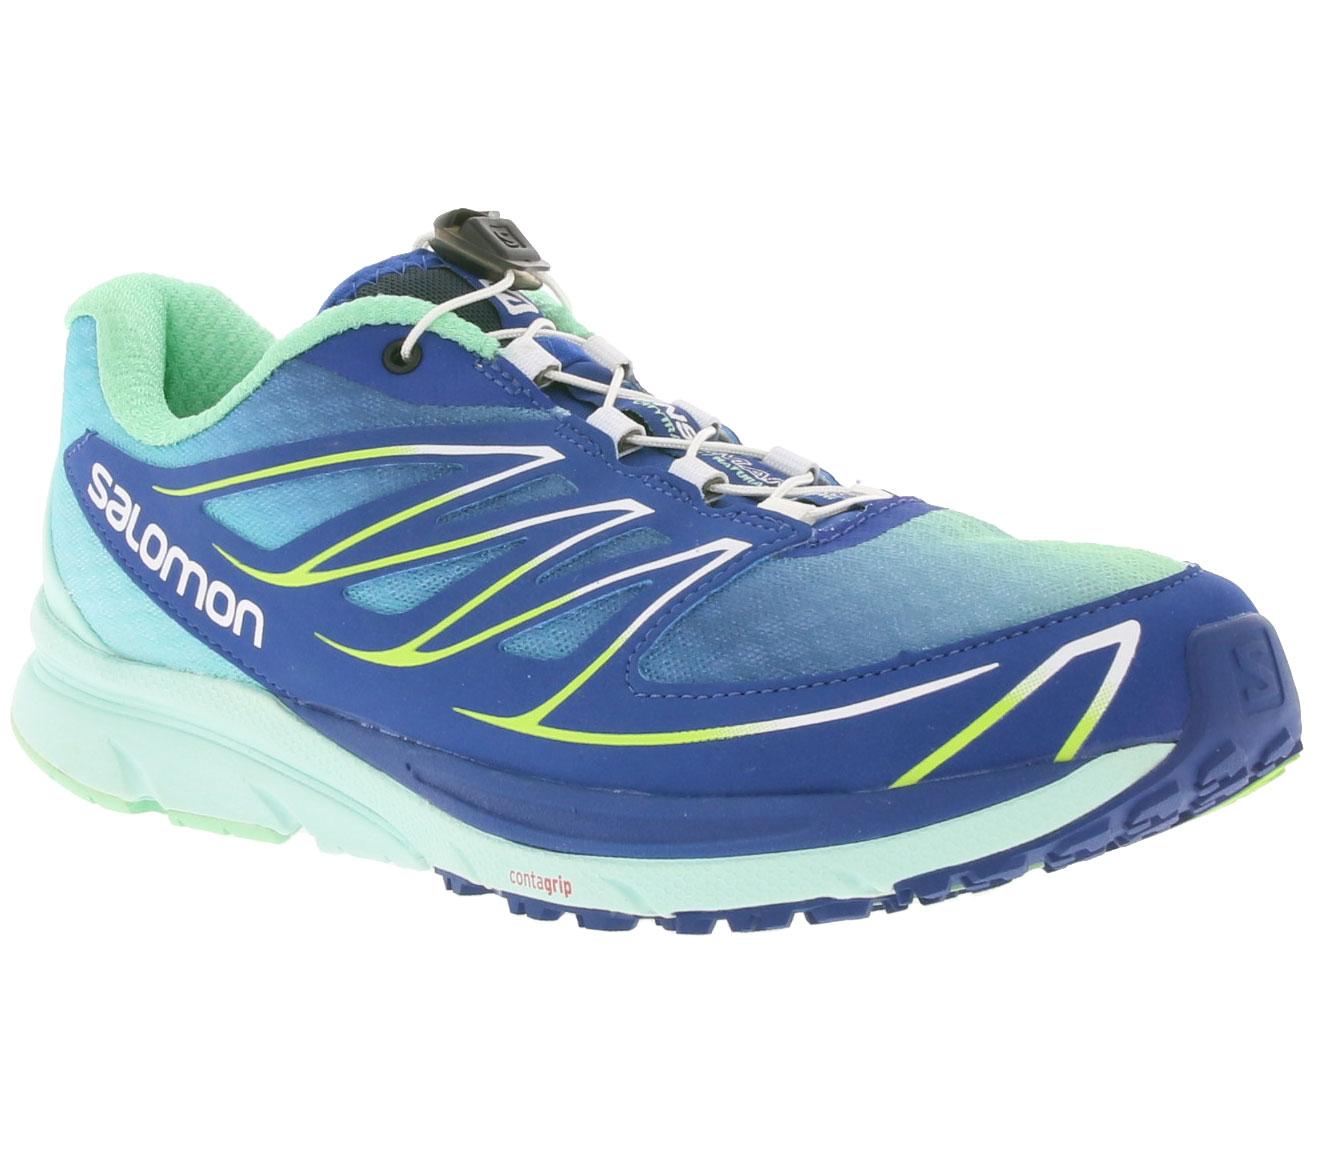 Salomon Sense Mantra 3 Damen Trailrunning Schuhe